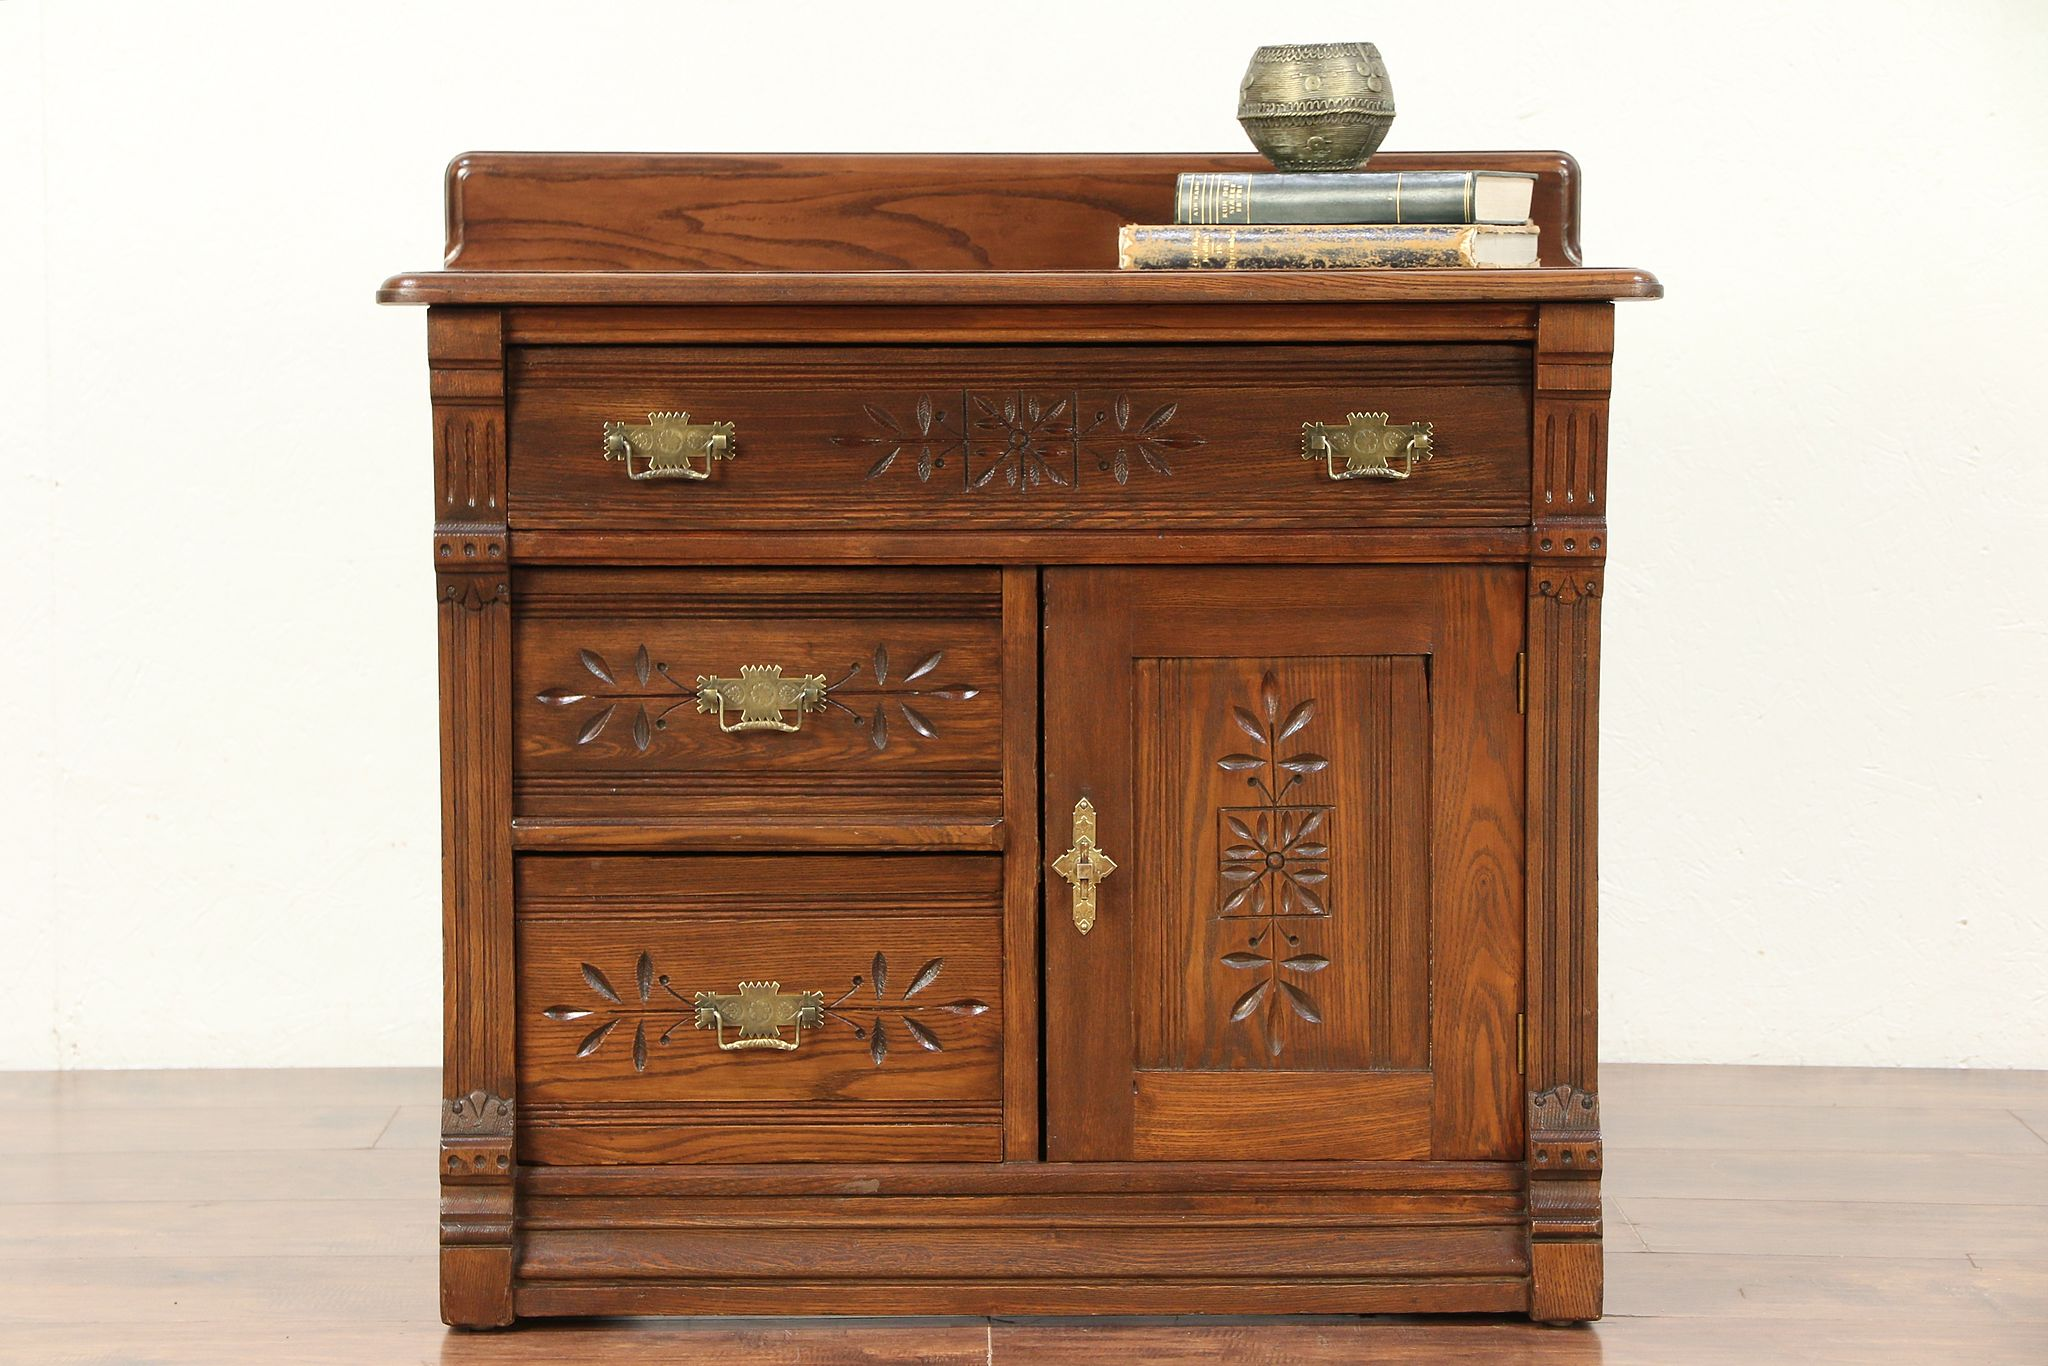 eastlake furniture years